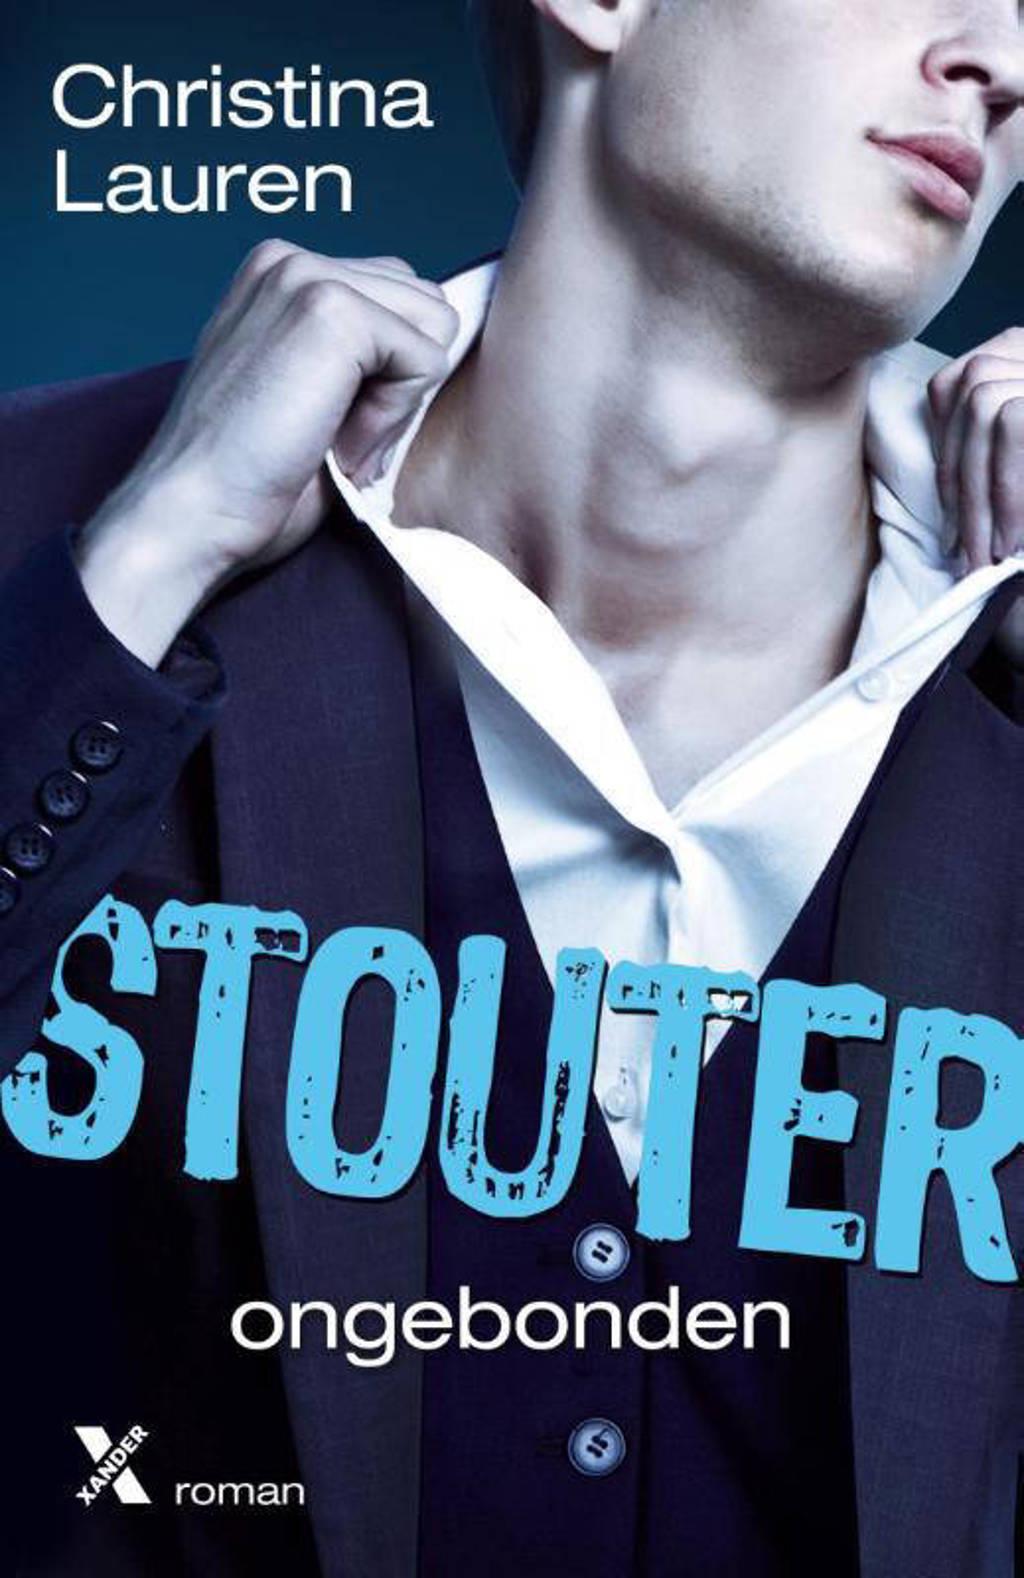 Stouter: Ongebonden - Christina Lauren